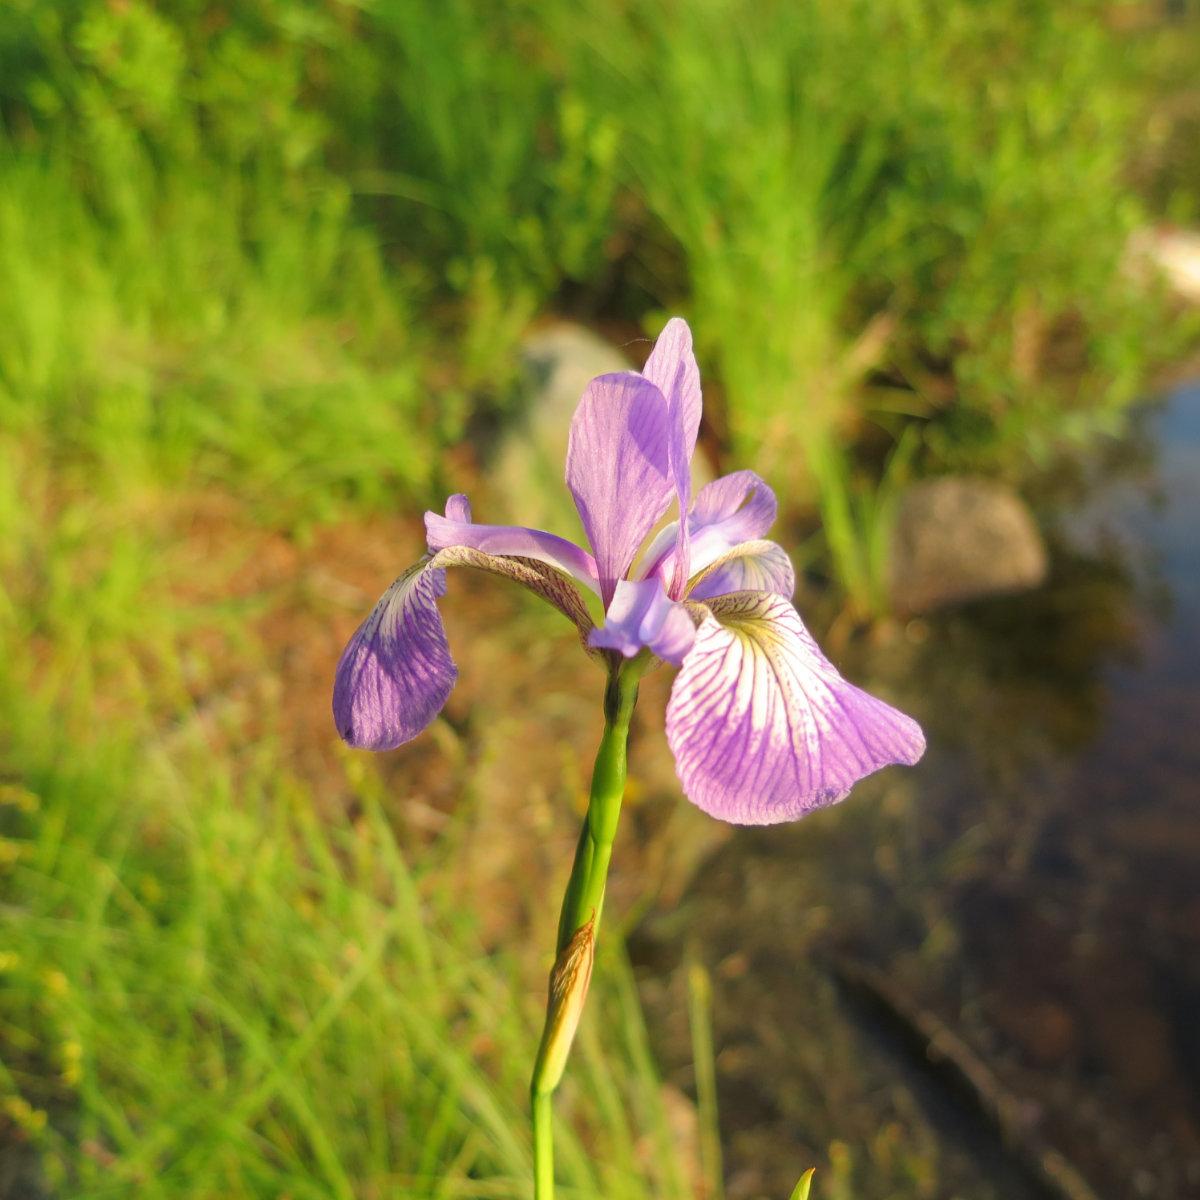 Iris-Prismatica-Grassy-Pond-BSP-20190704